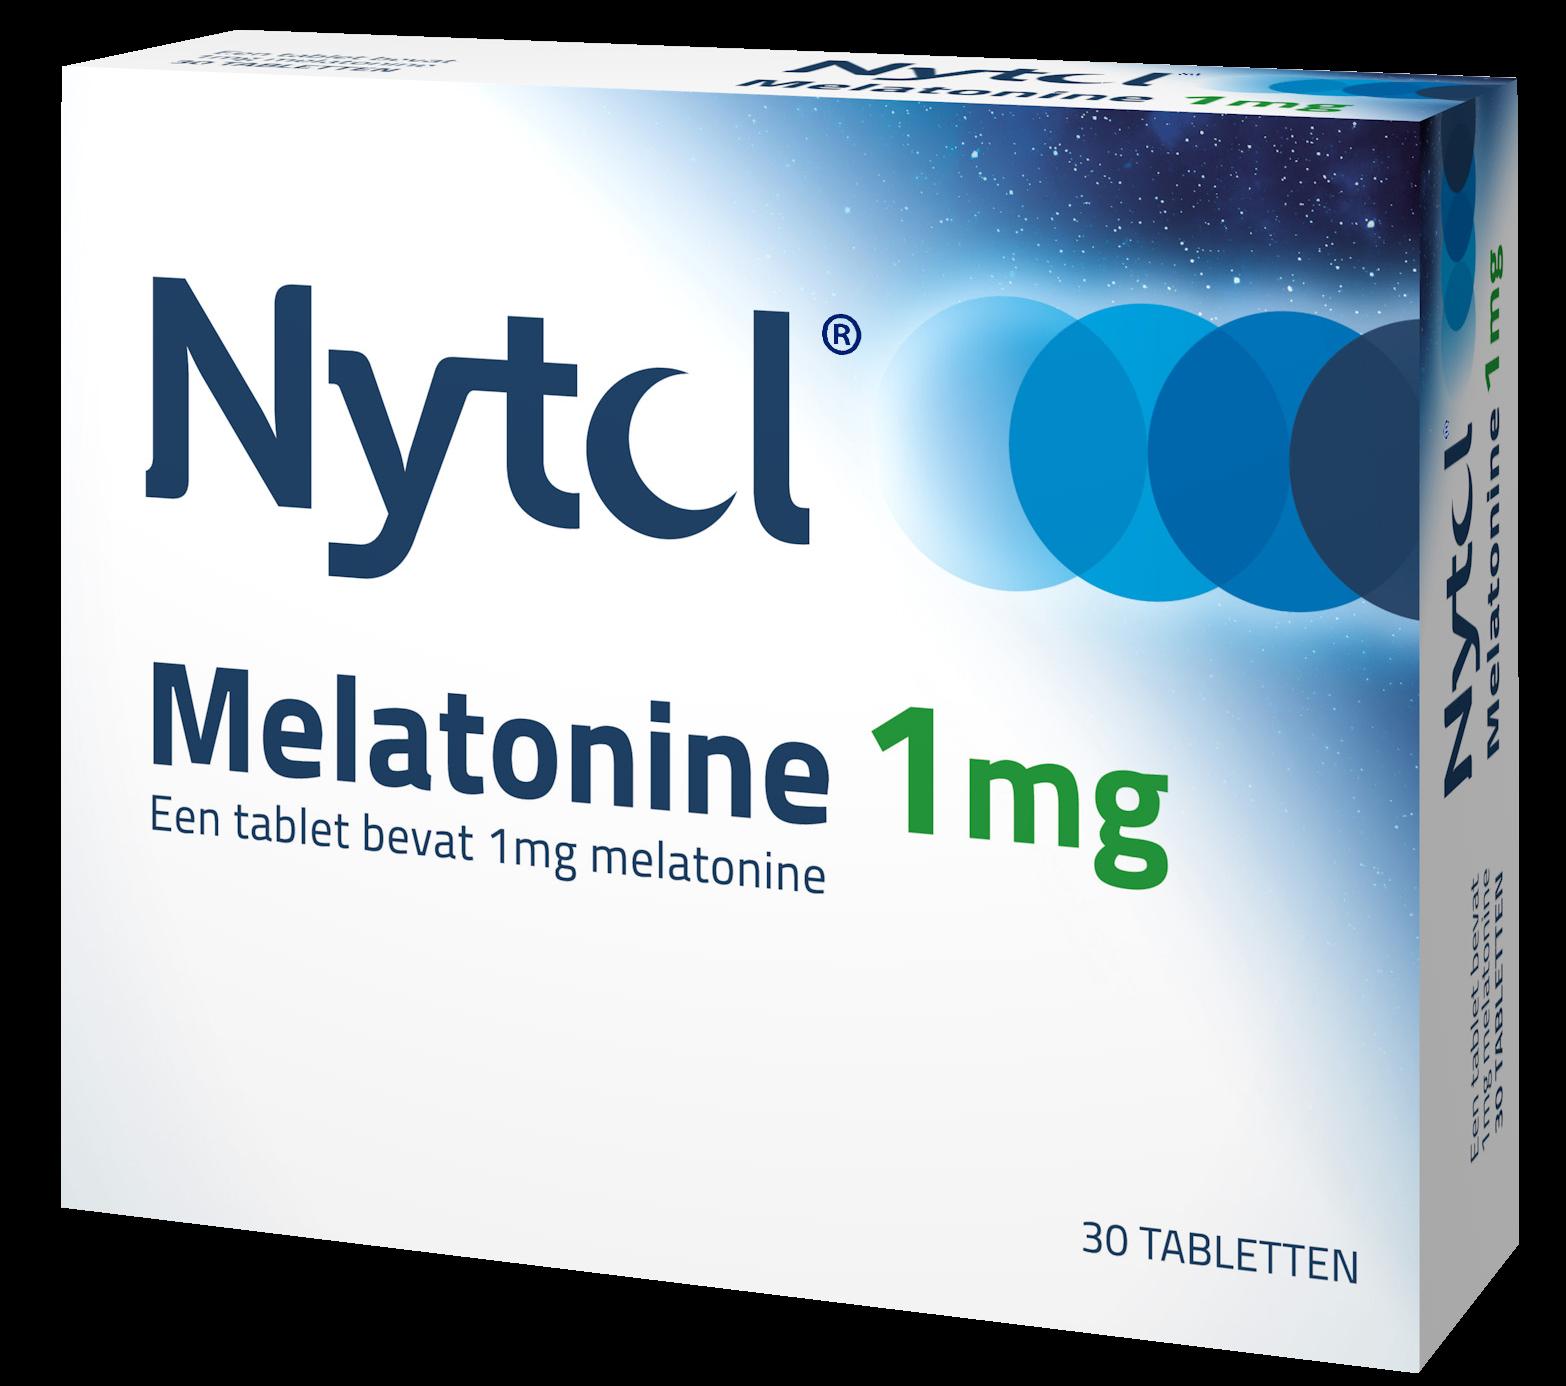 Nytol Melatonine 1mg